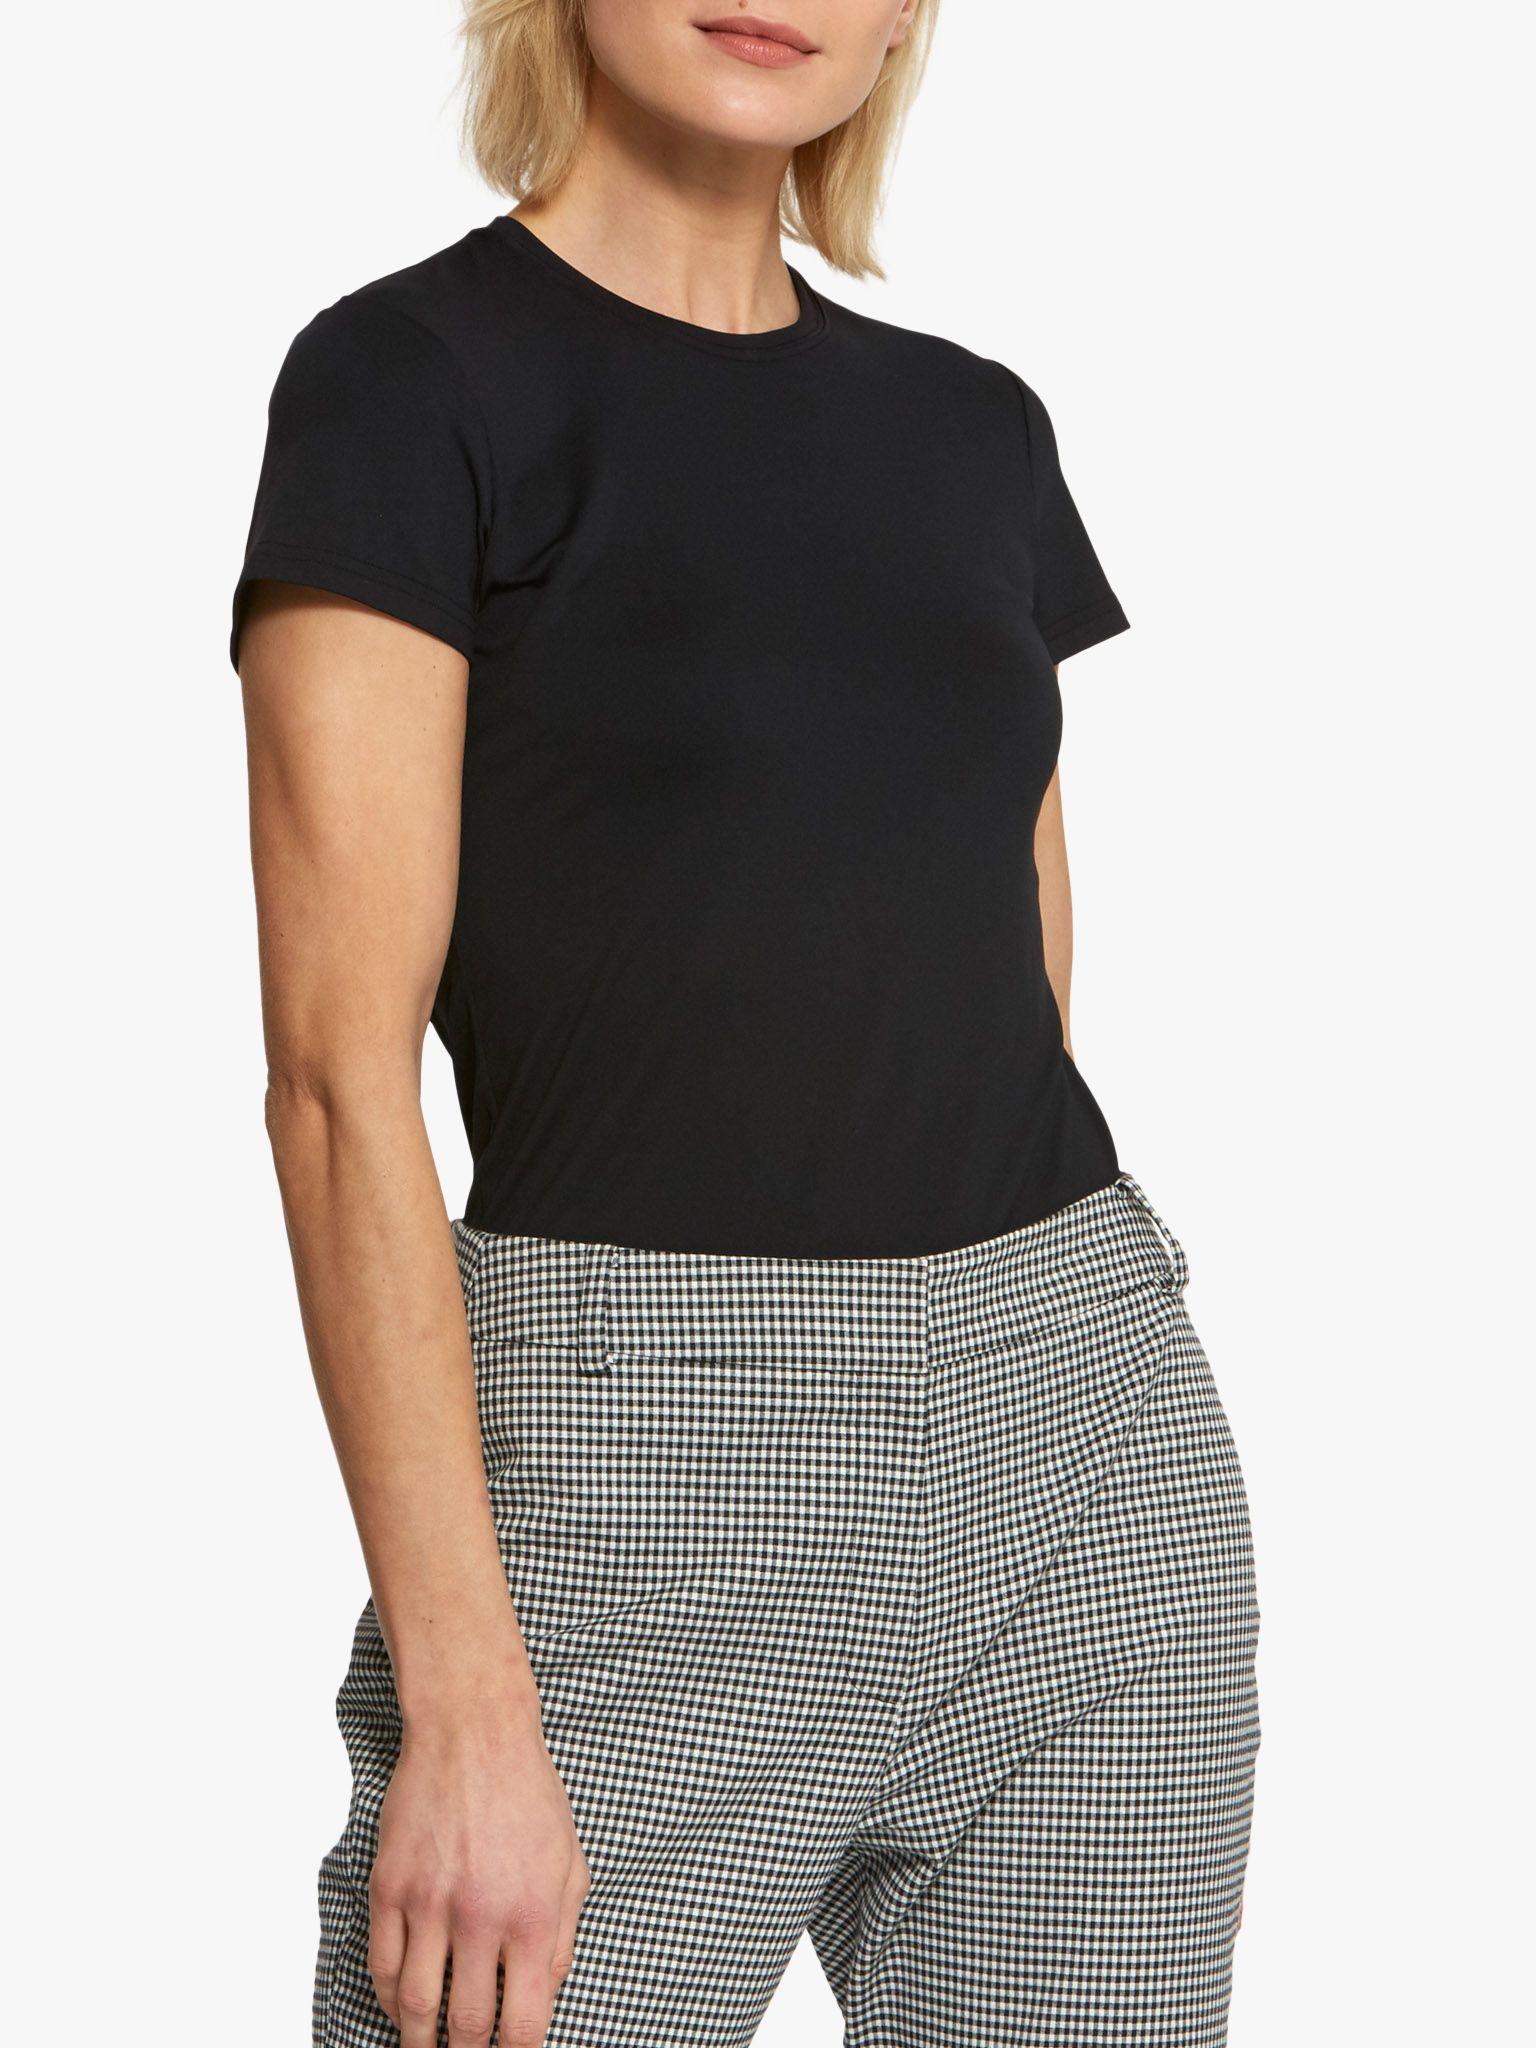 Helen McAlinden Helen McAlinden Round Neck Short Sleeve T-Shirt, Black